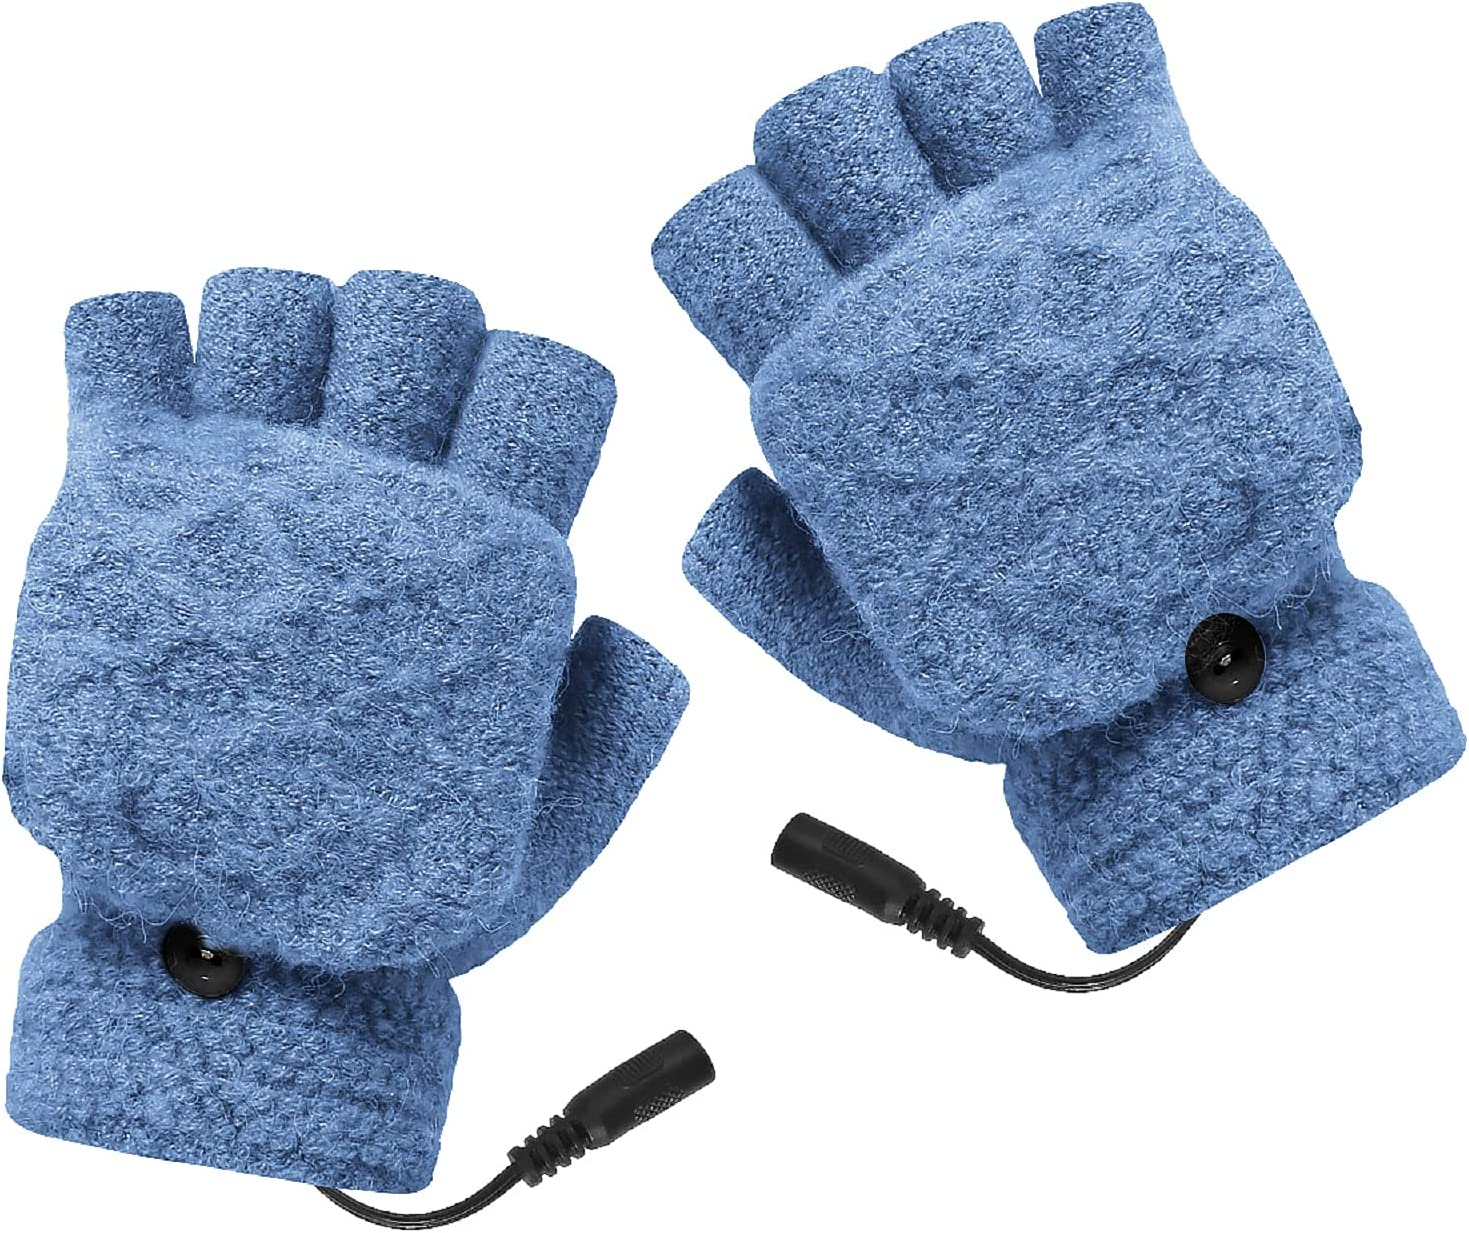 Unisex USB Heated Gloves Adjustable Temperature Winter Full & Half Fingers Warmer Laptop Gloves Mittens for Women Men Girls Boys